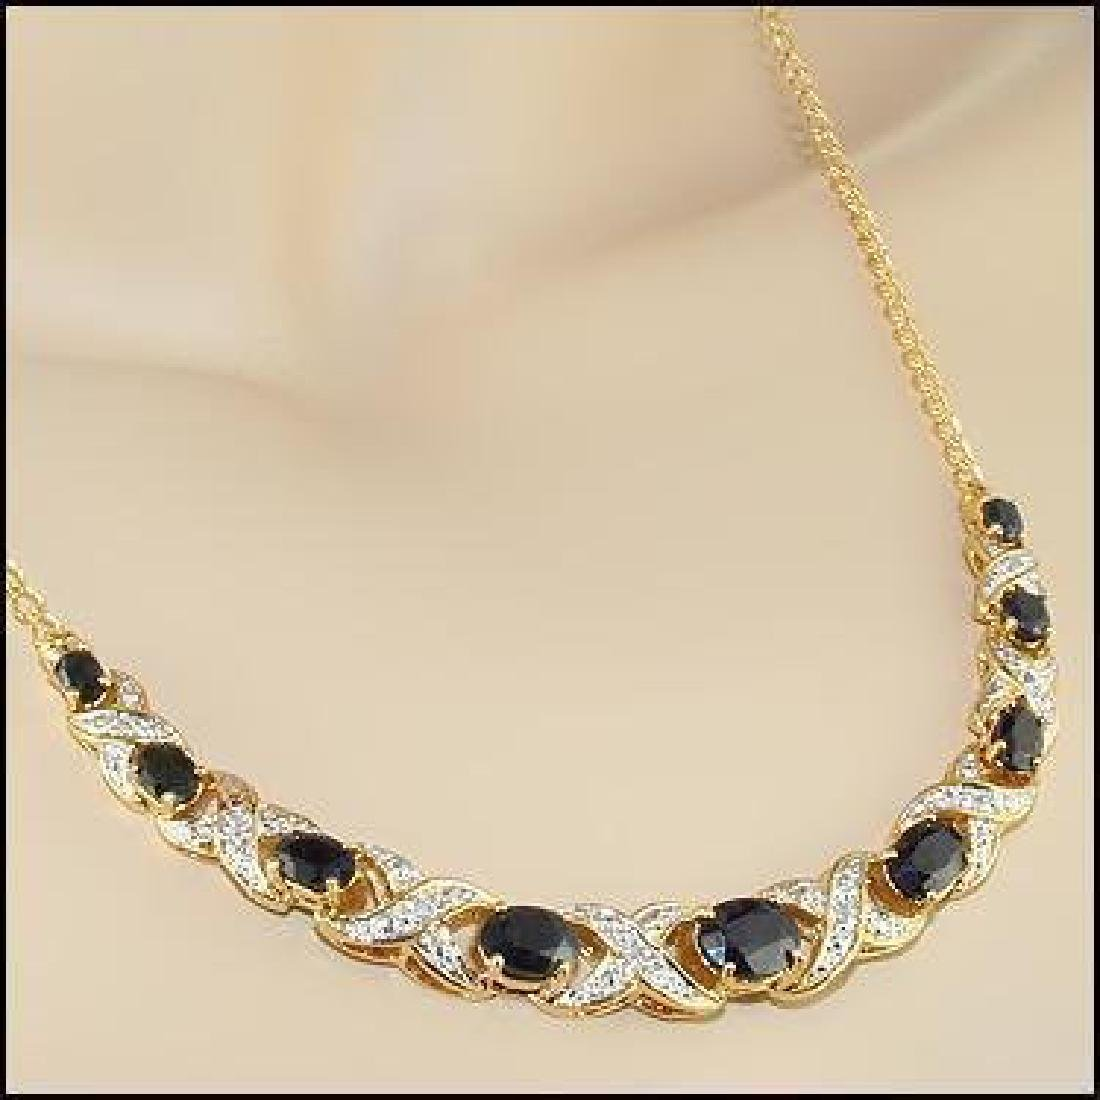 12.37 CT Sapphire & Diamond Designer Necklace $1,415